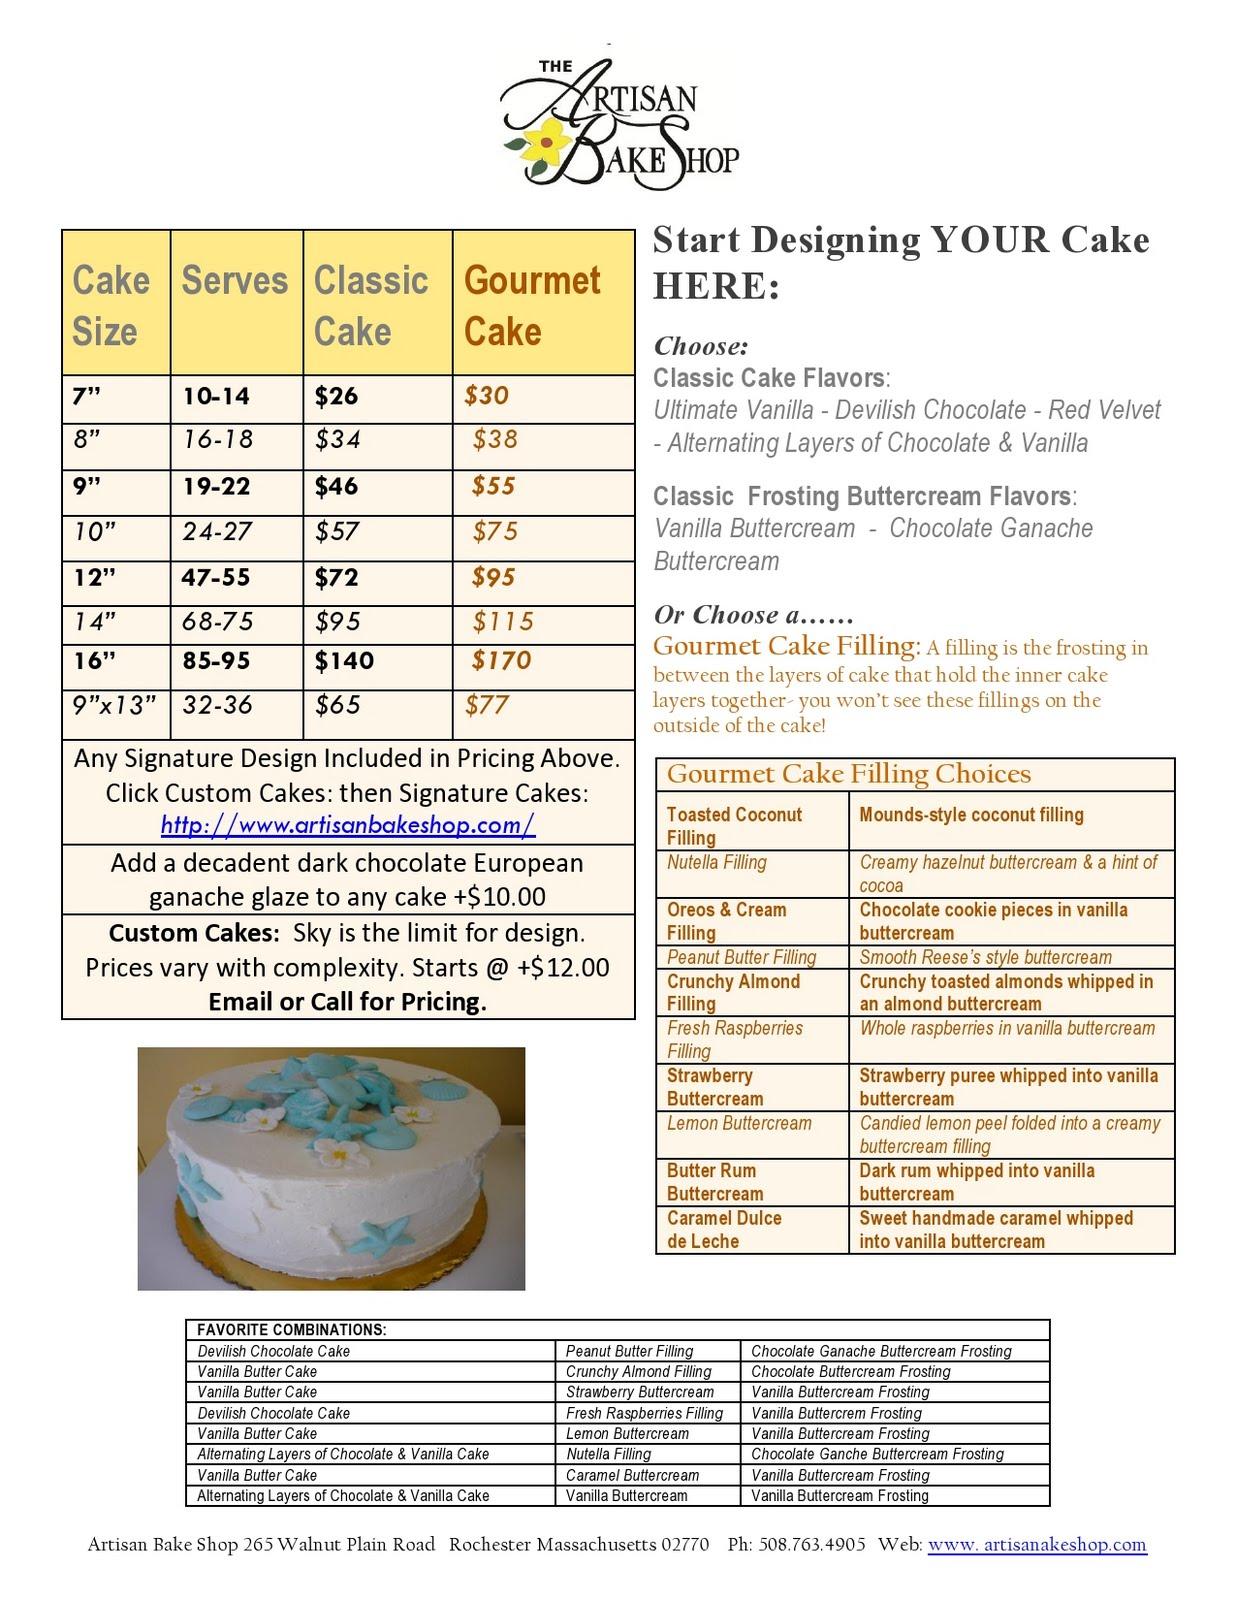 pin walmart bakery cake prices on pinterest